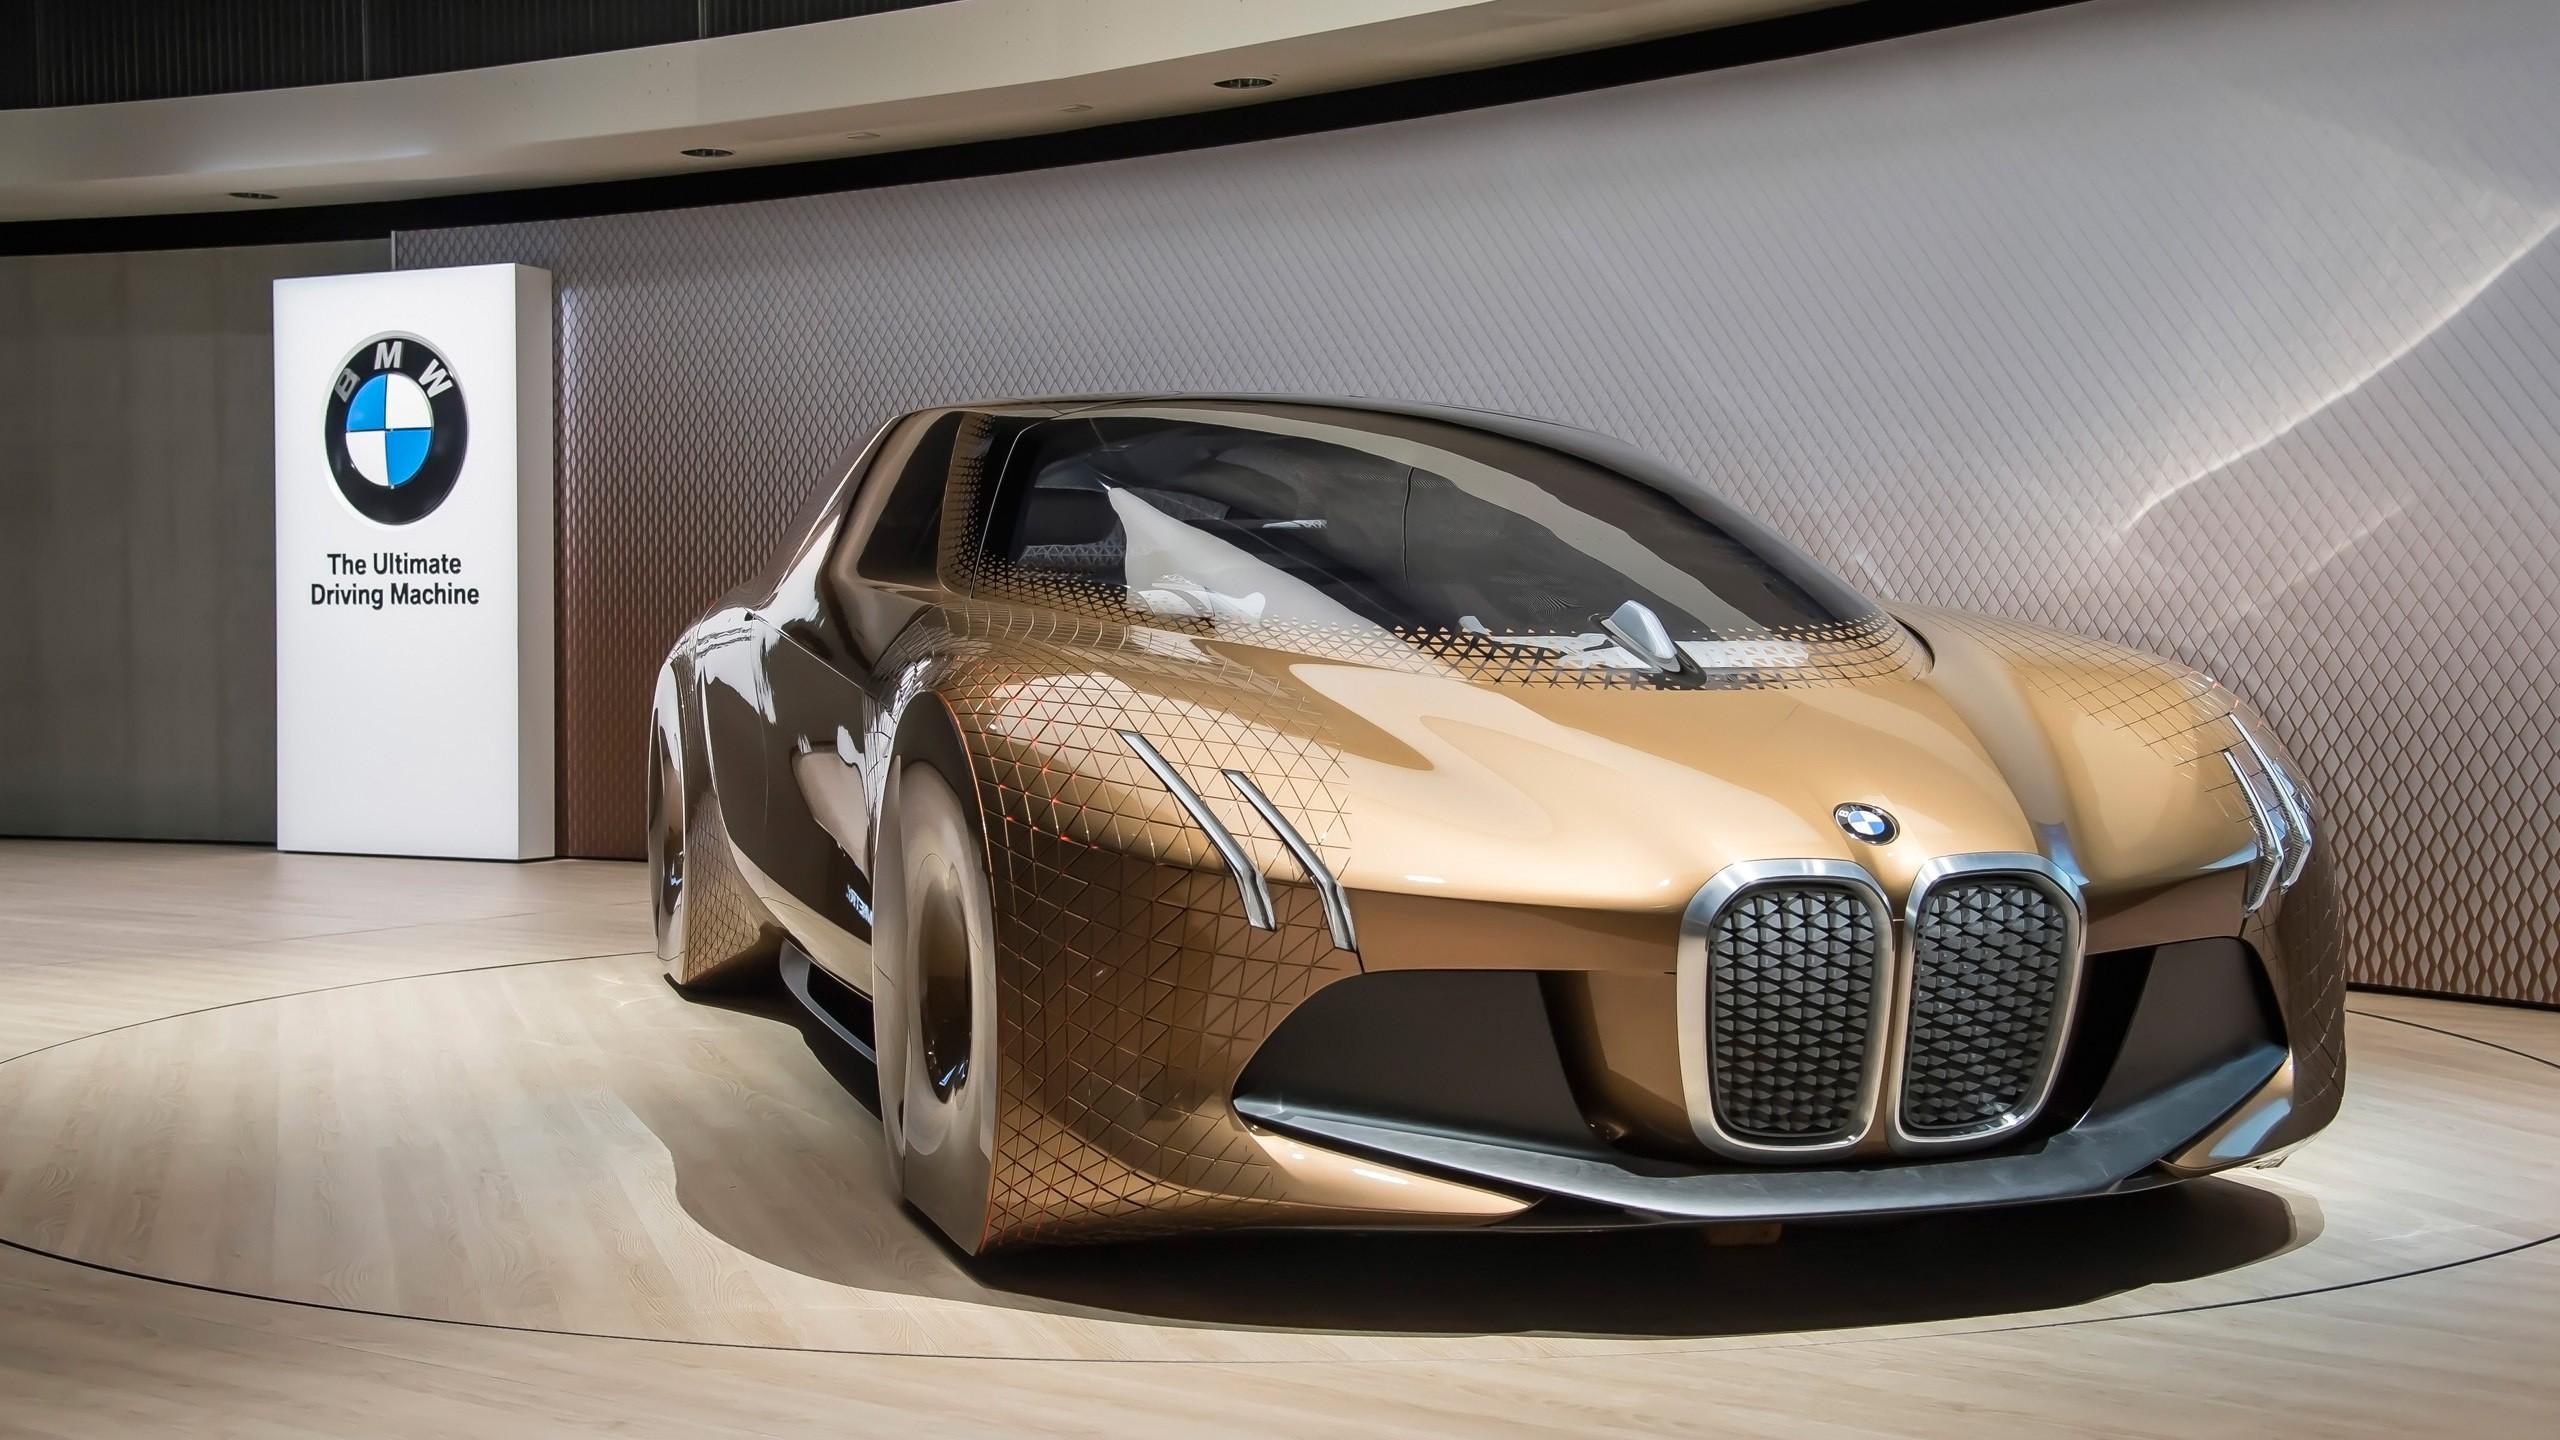 2016 BMW Vision Next 100 Iconic Impulses Wallpaper